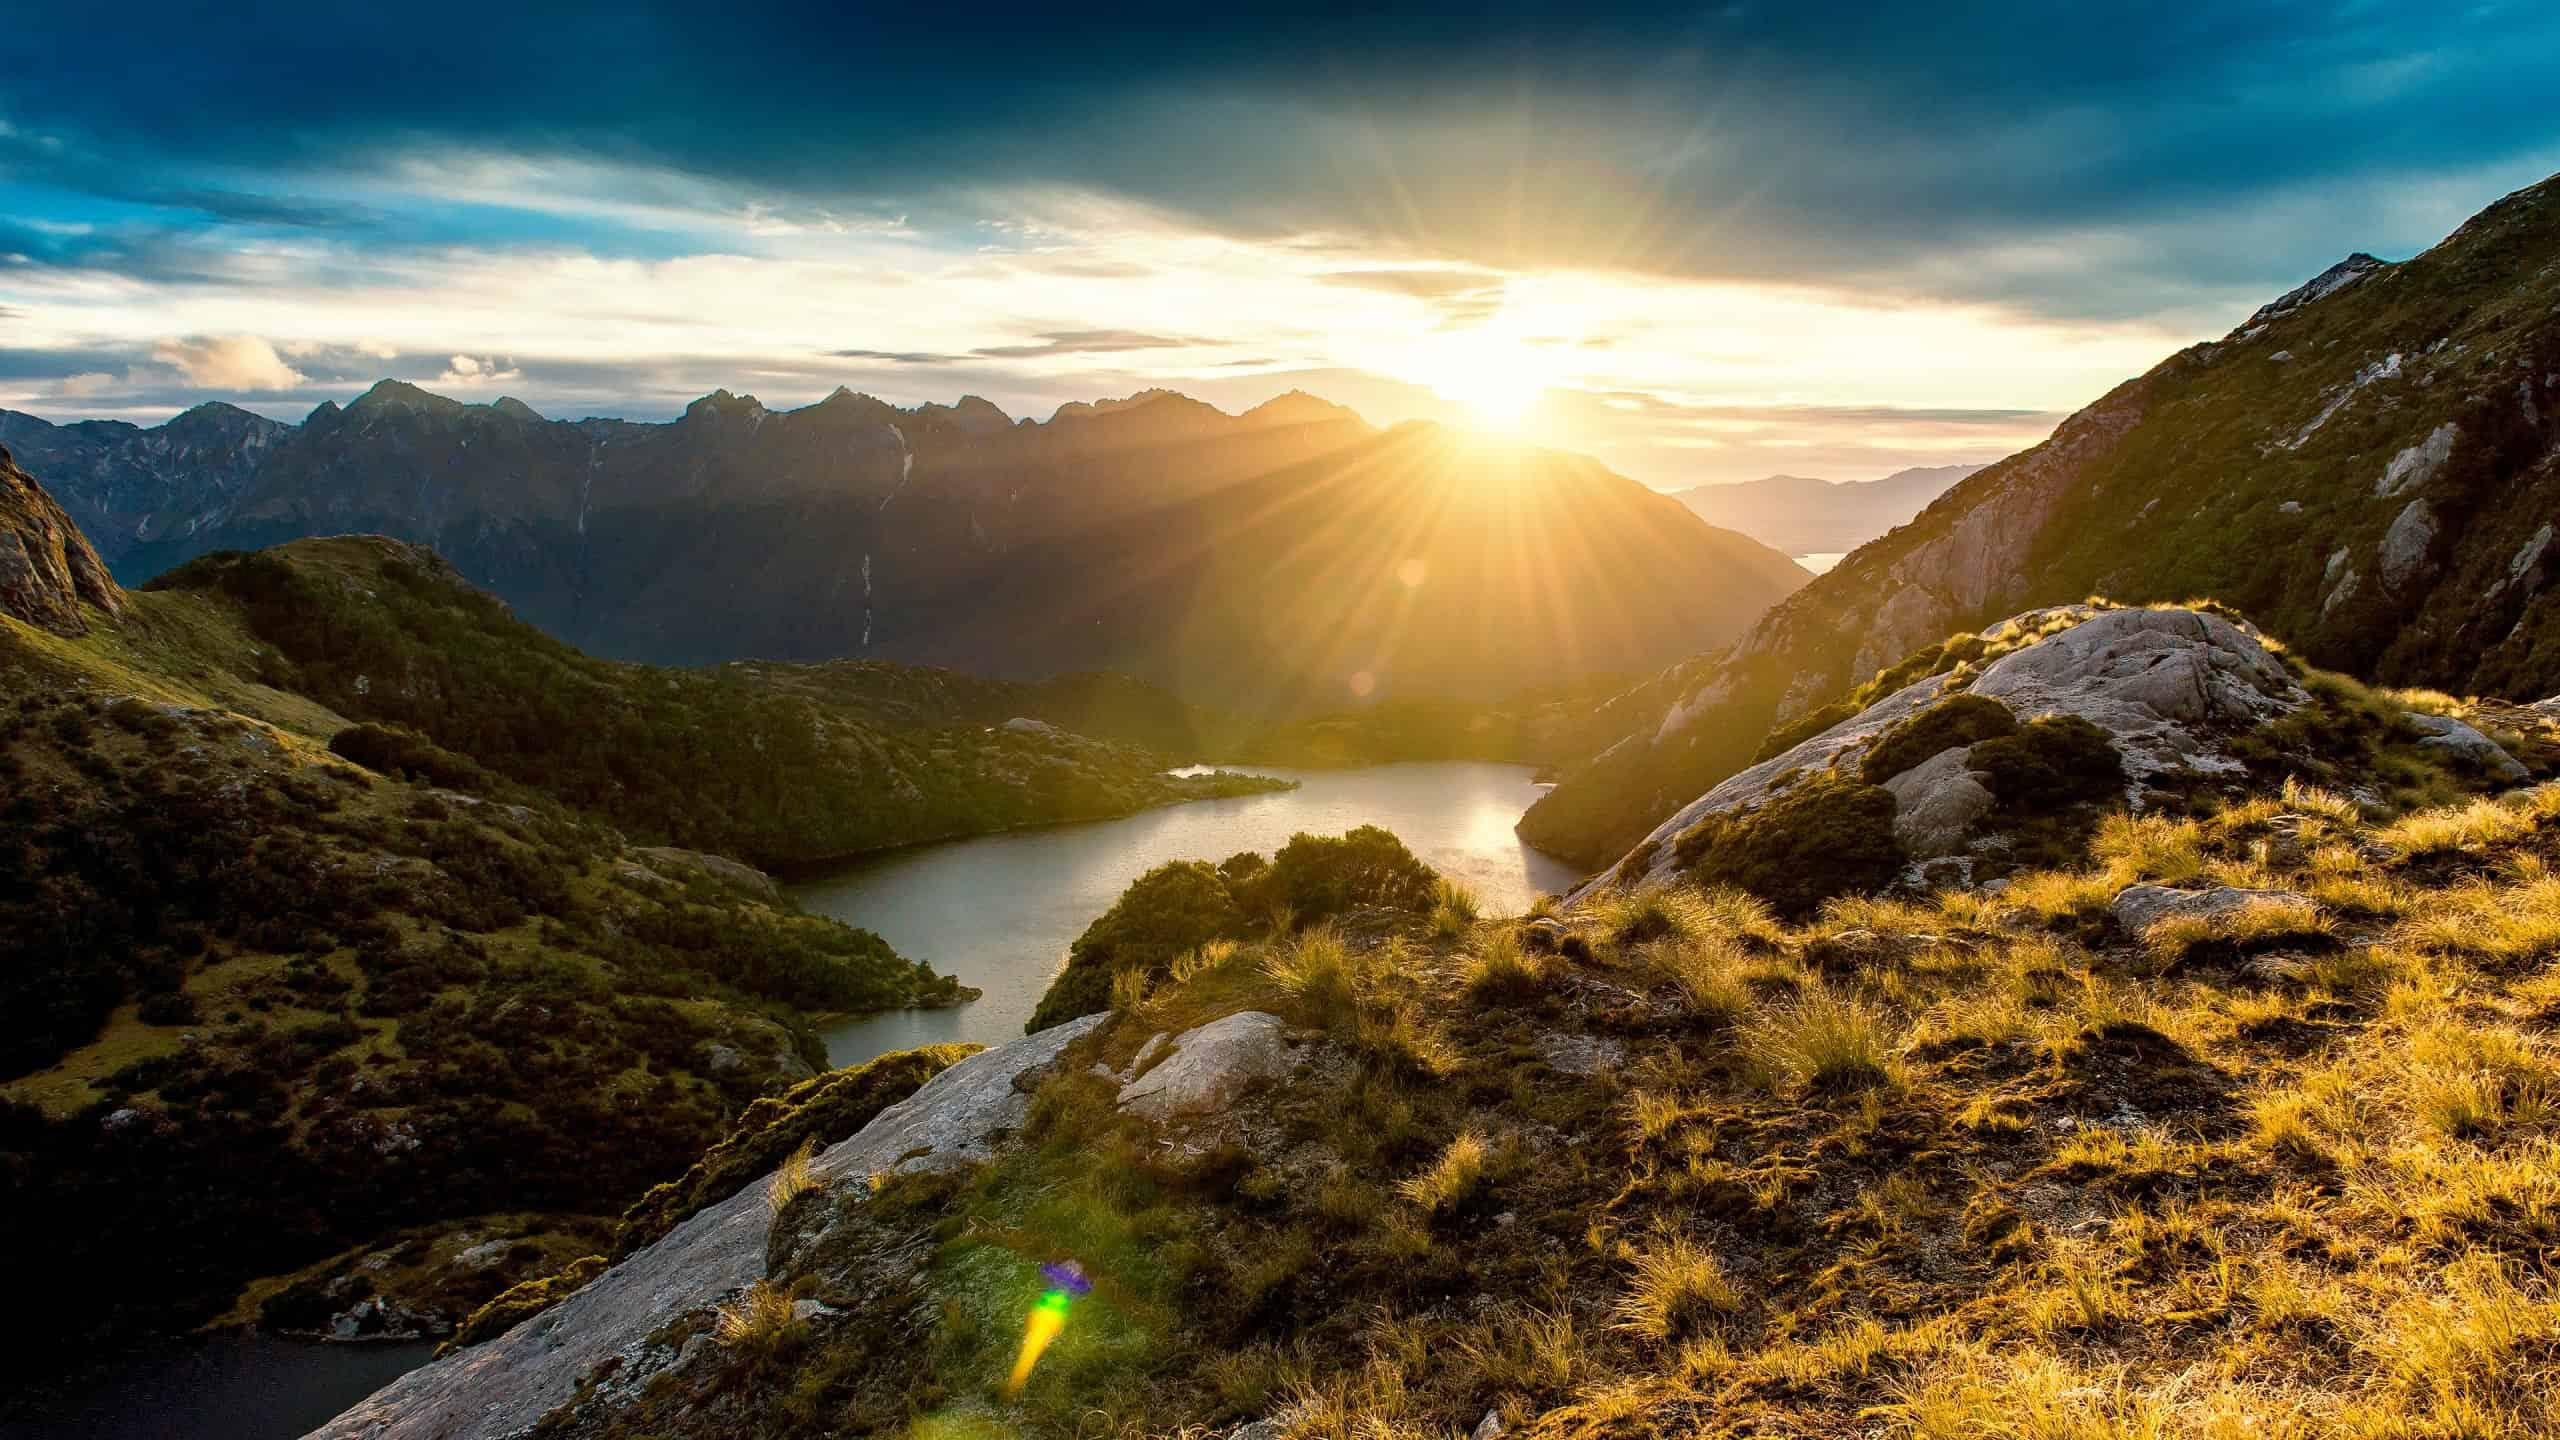 Fiordland Mountain Sunrise New Zealand Wqhd 1440p Wallpaper Best Images 4k 2560x1440 Download Hd Wallpaper Wallpapertip